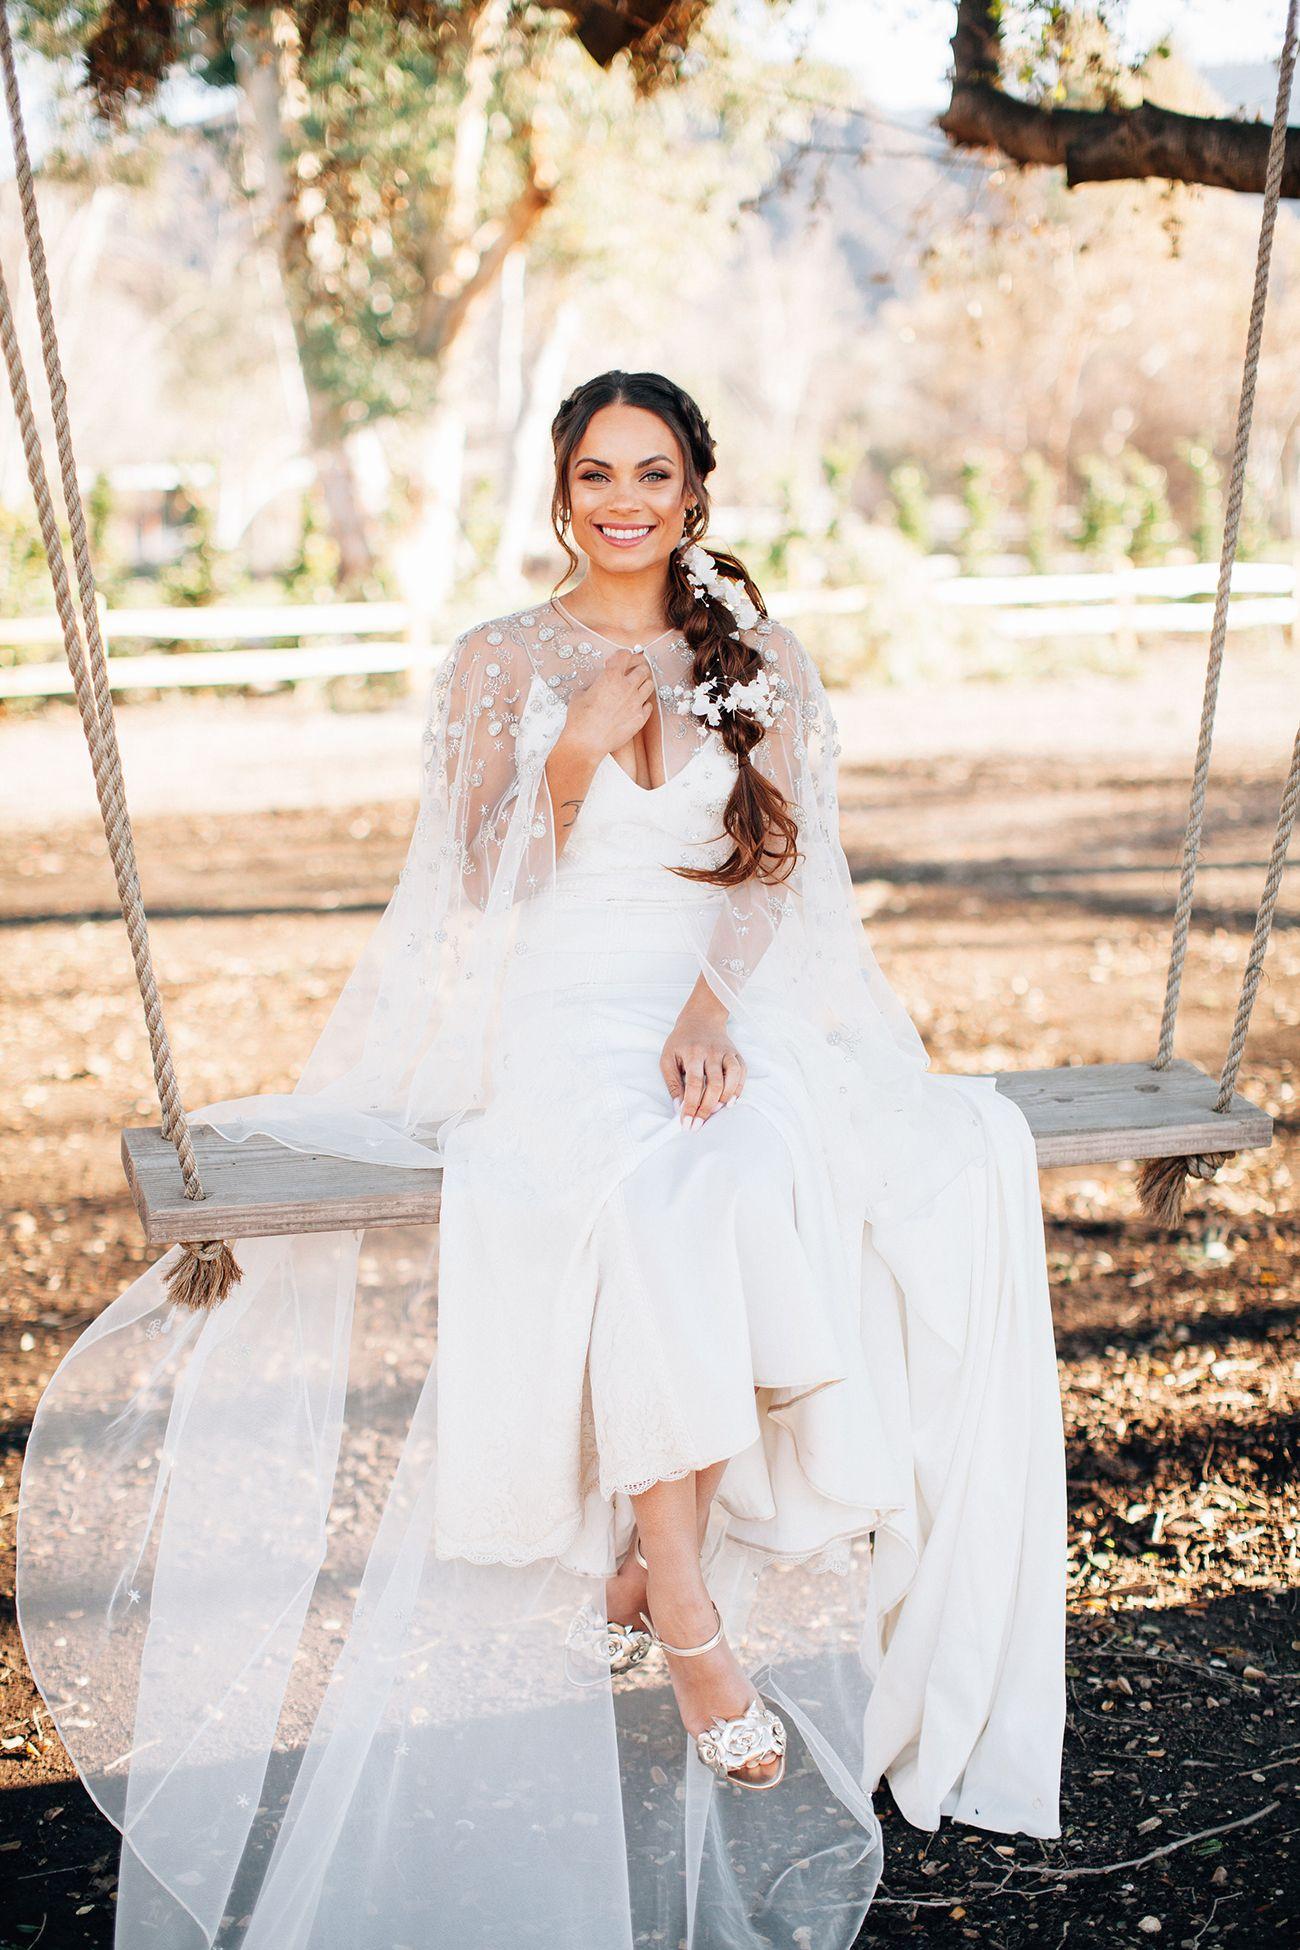 Introducing The Gorgeous Gws Zadie Shoe With Rachel Simpson Green Wedding Shoes Rachel Simpson Princess Ball Gowns Bridal Fashion Week [ 1950 x 1300 Pixel ]